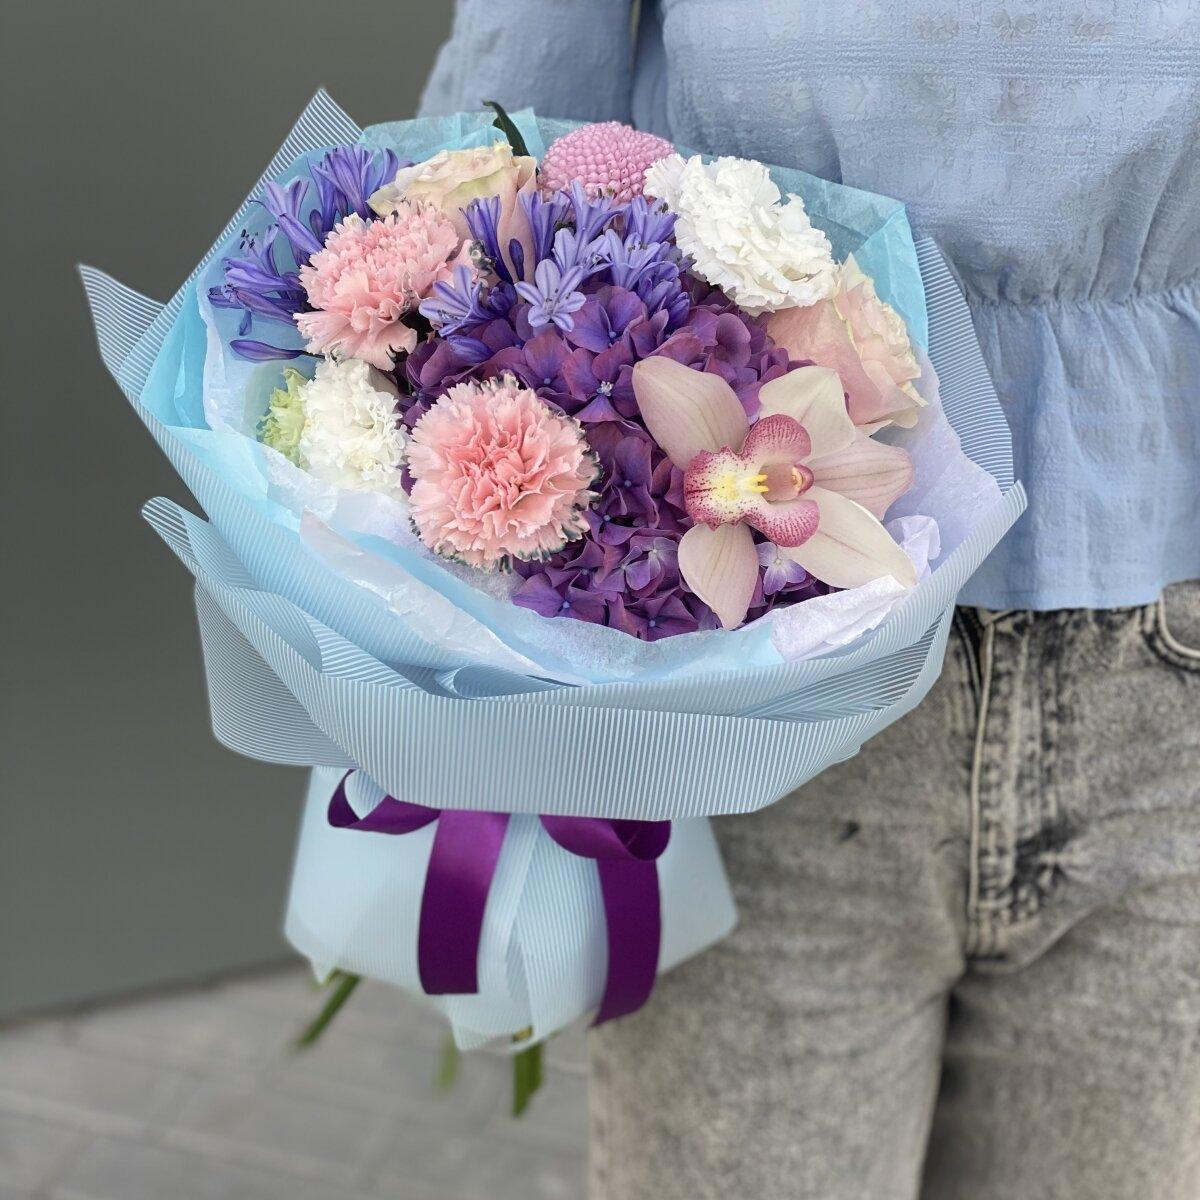 Букет Утреннее небо из гортензиии, агапантуса, момоки, роз и диантуса